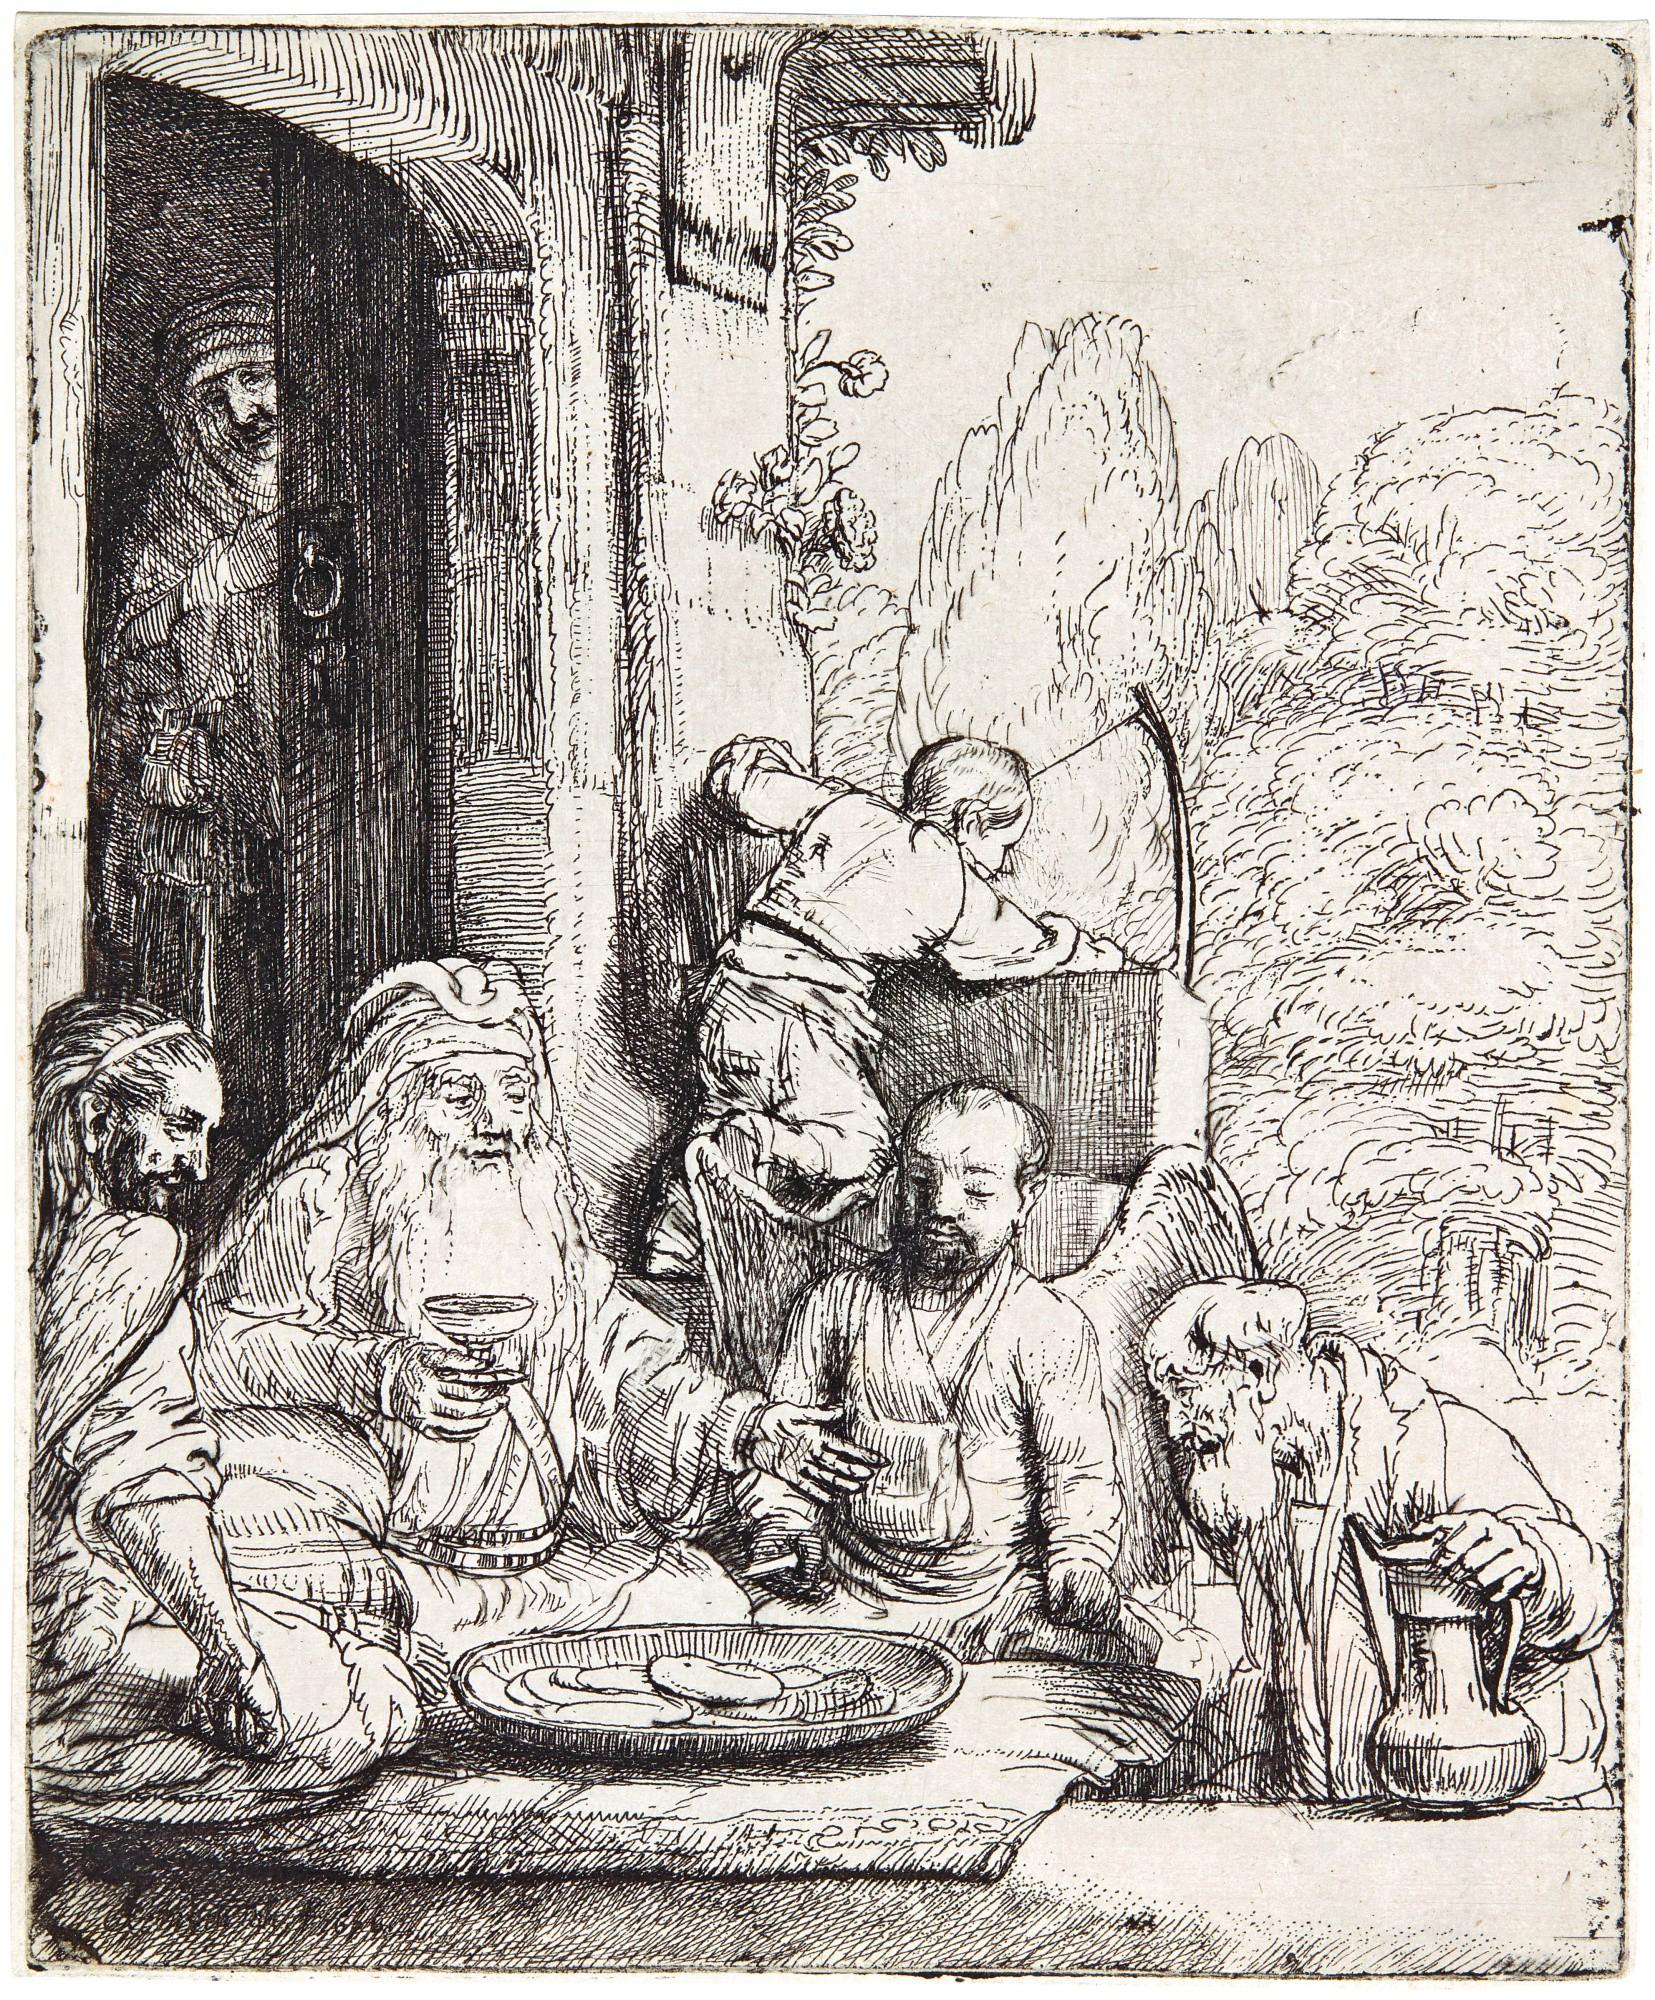 REMBRANDT HARMENSZ. VAN RIJN | ABRAHAM ENTERTAINING THE ANGELS (B., HOLL. 29; NEW HOLL. 295; H. 286)